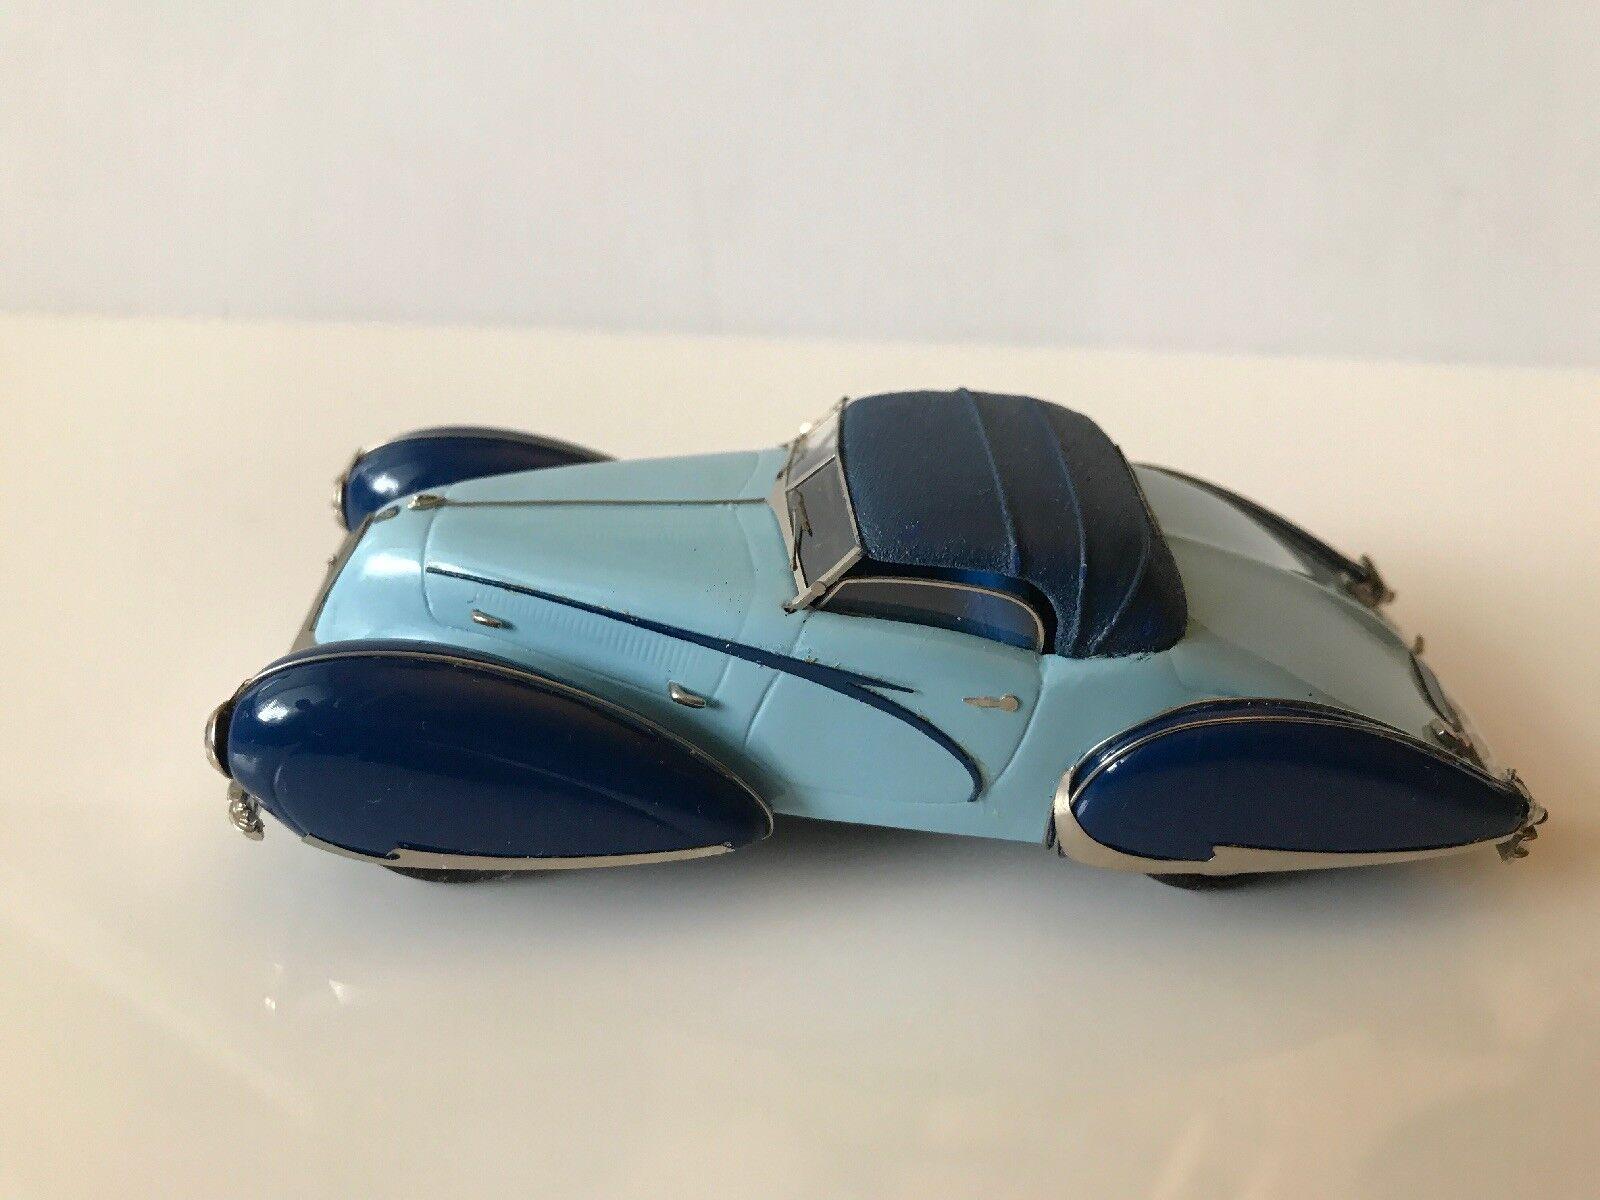 1 43 Scale Resin Model Model Model 1038 Talbot Lago T150 SS Roadster 1afb30